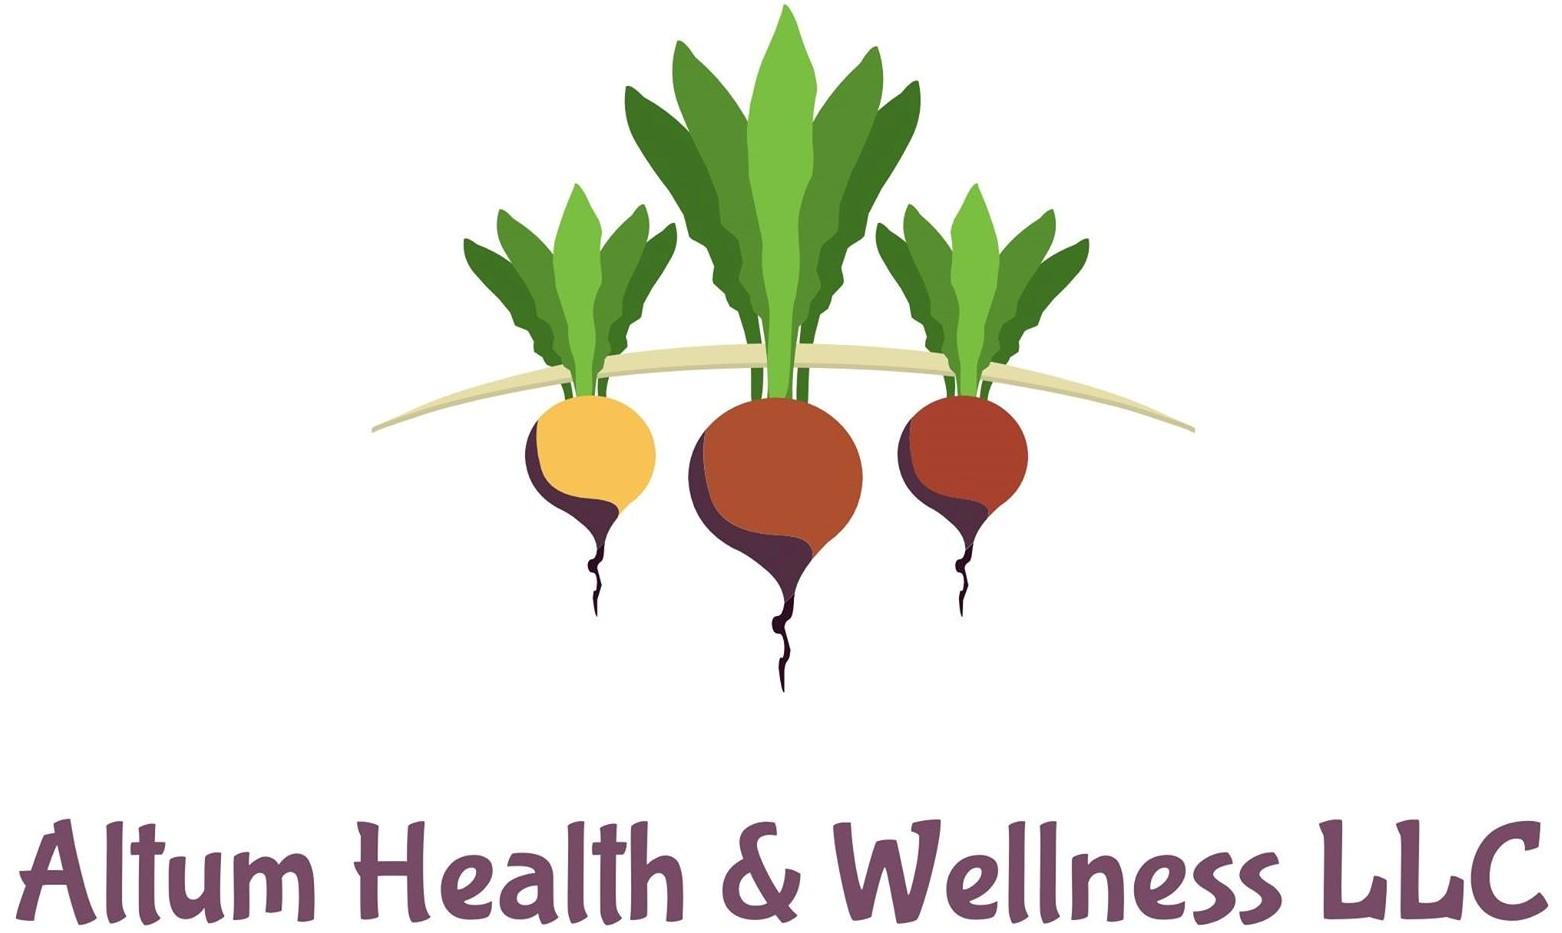 ALTUM Health & Wellness